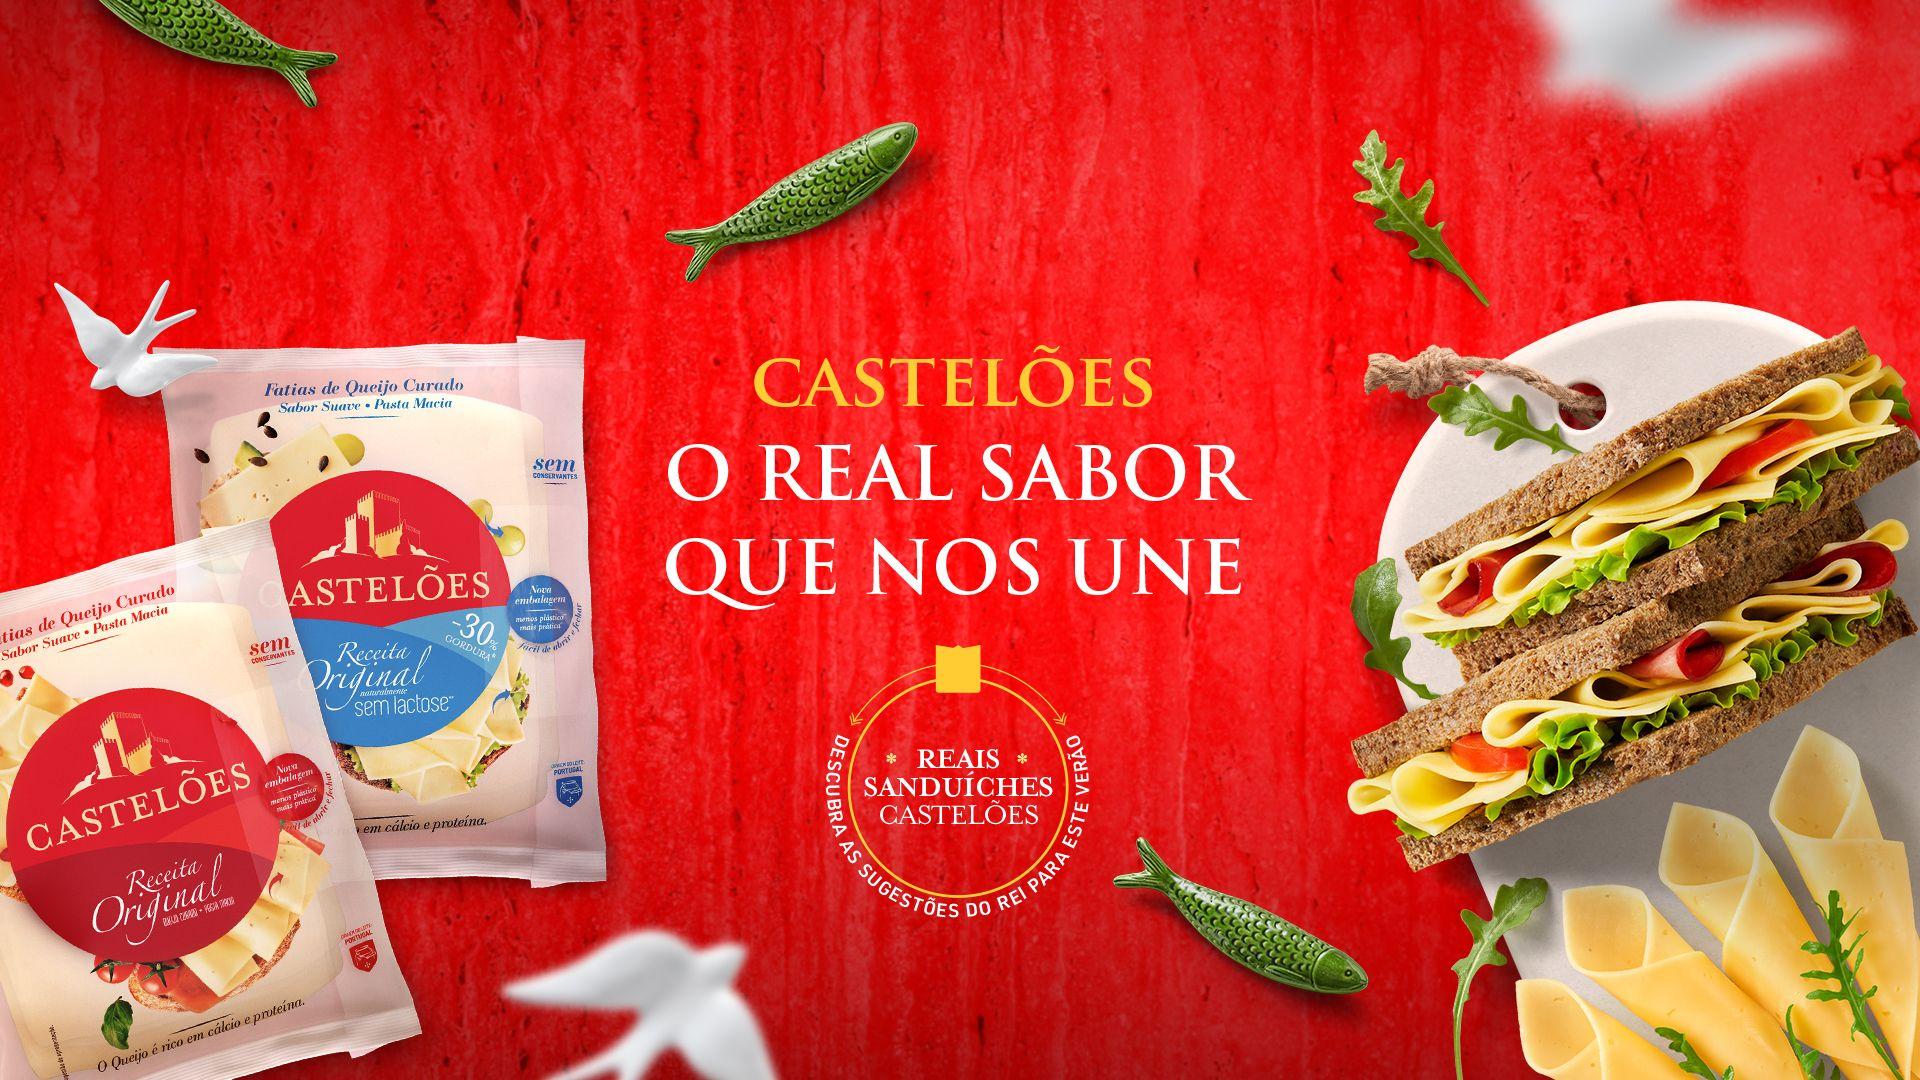 casteloes_verao21_home_header_1920x1080-v2